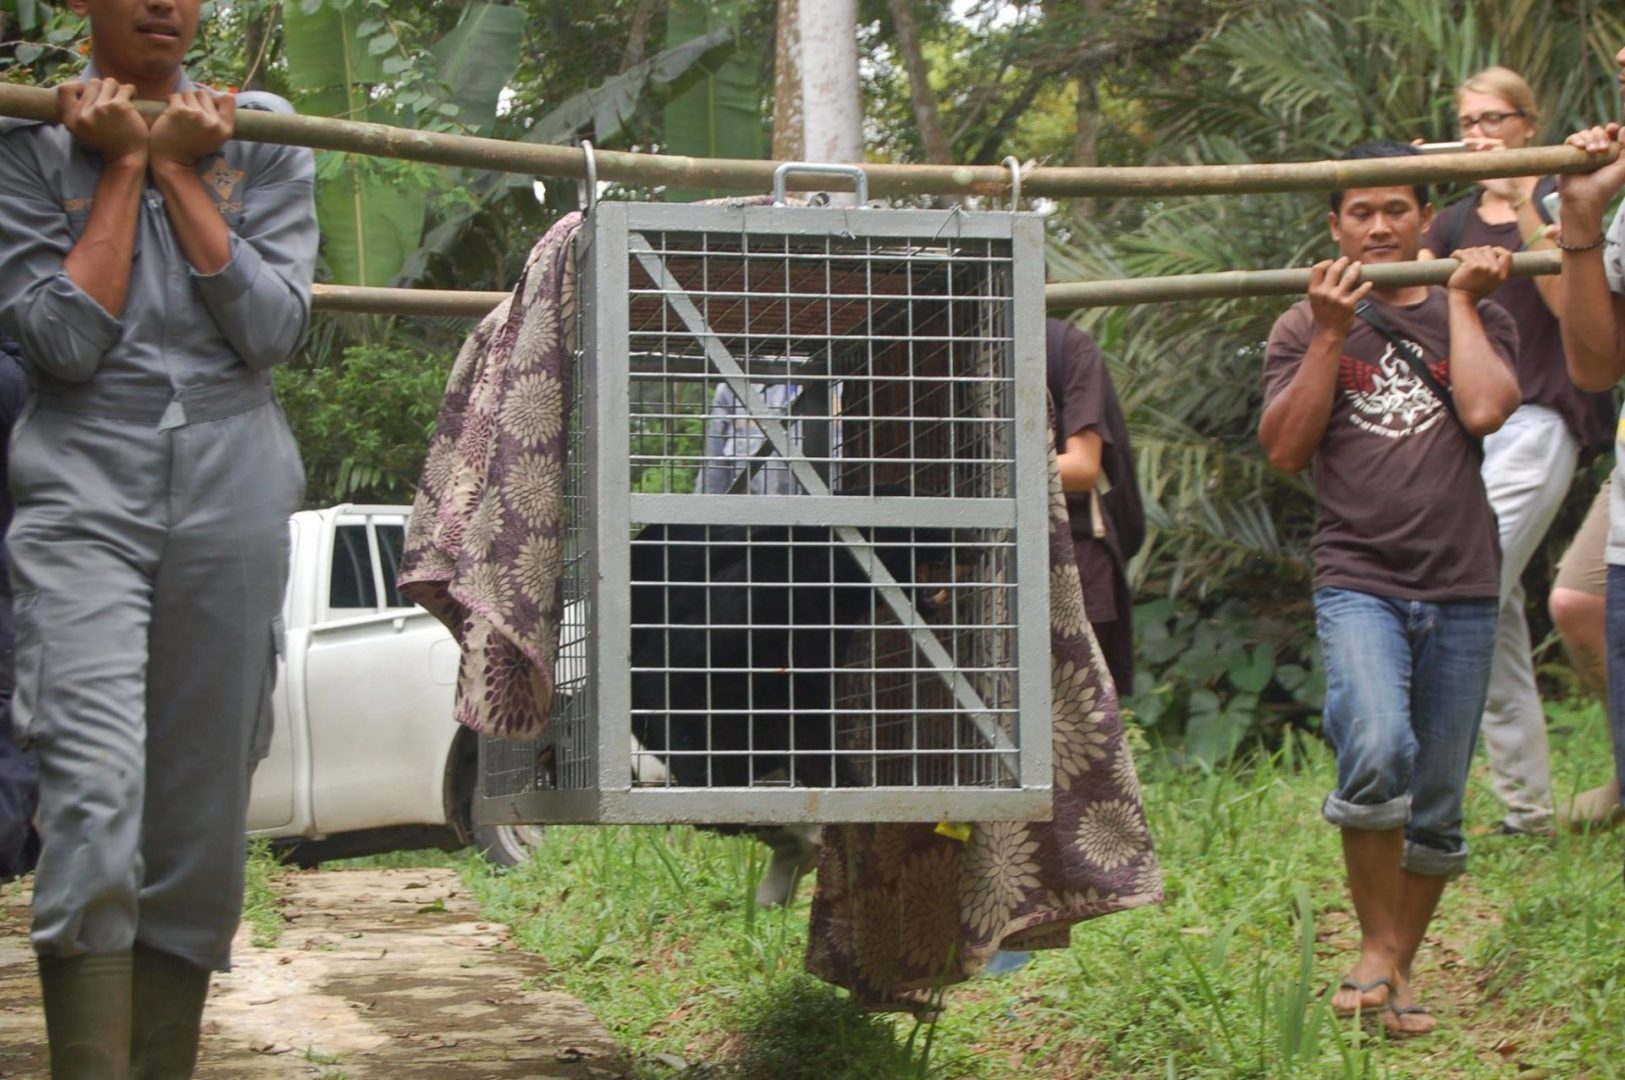 Inspiring Animal Rescue Stories From Cikananga In West Java, Indonesia